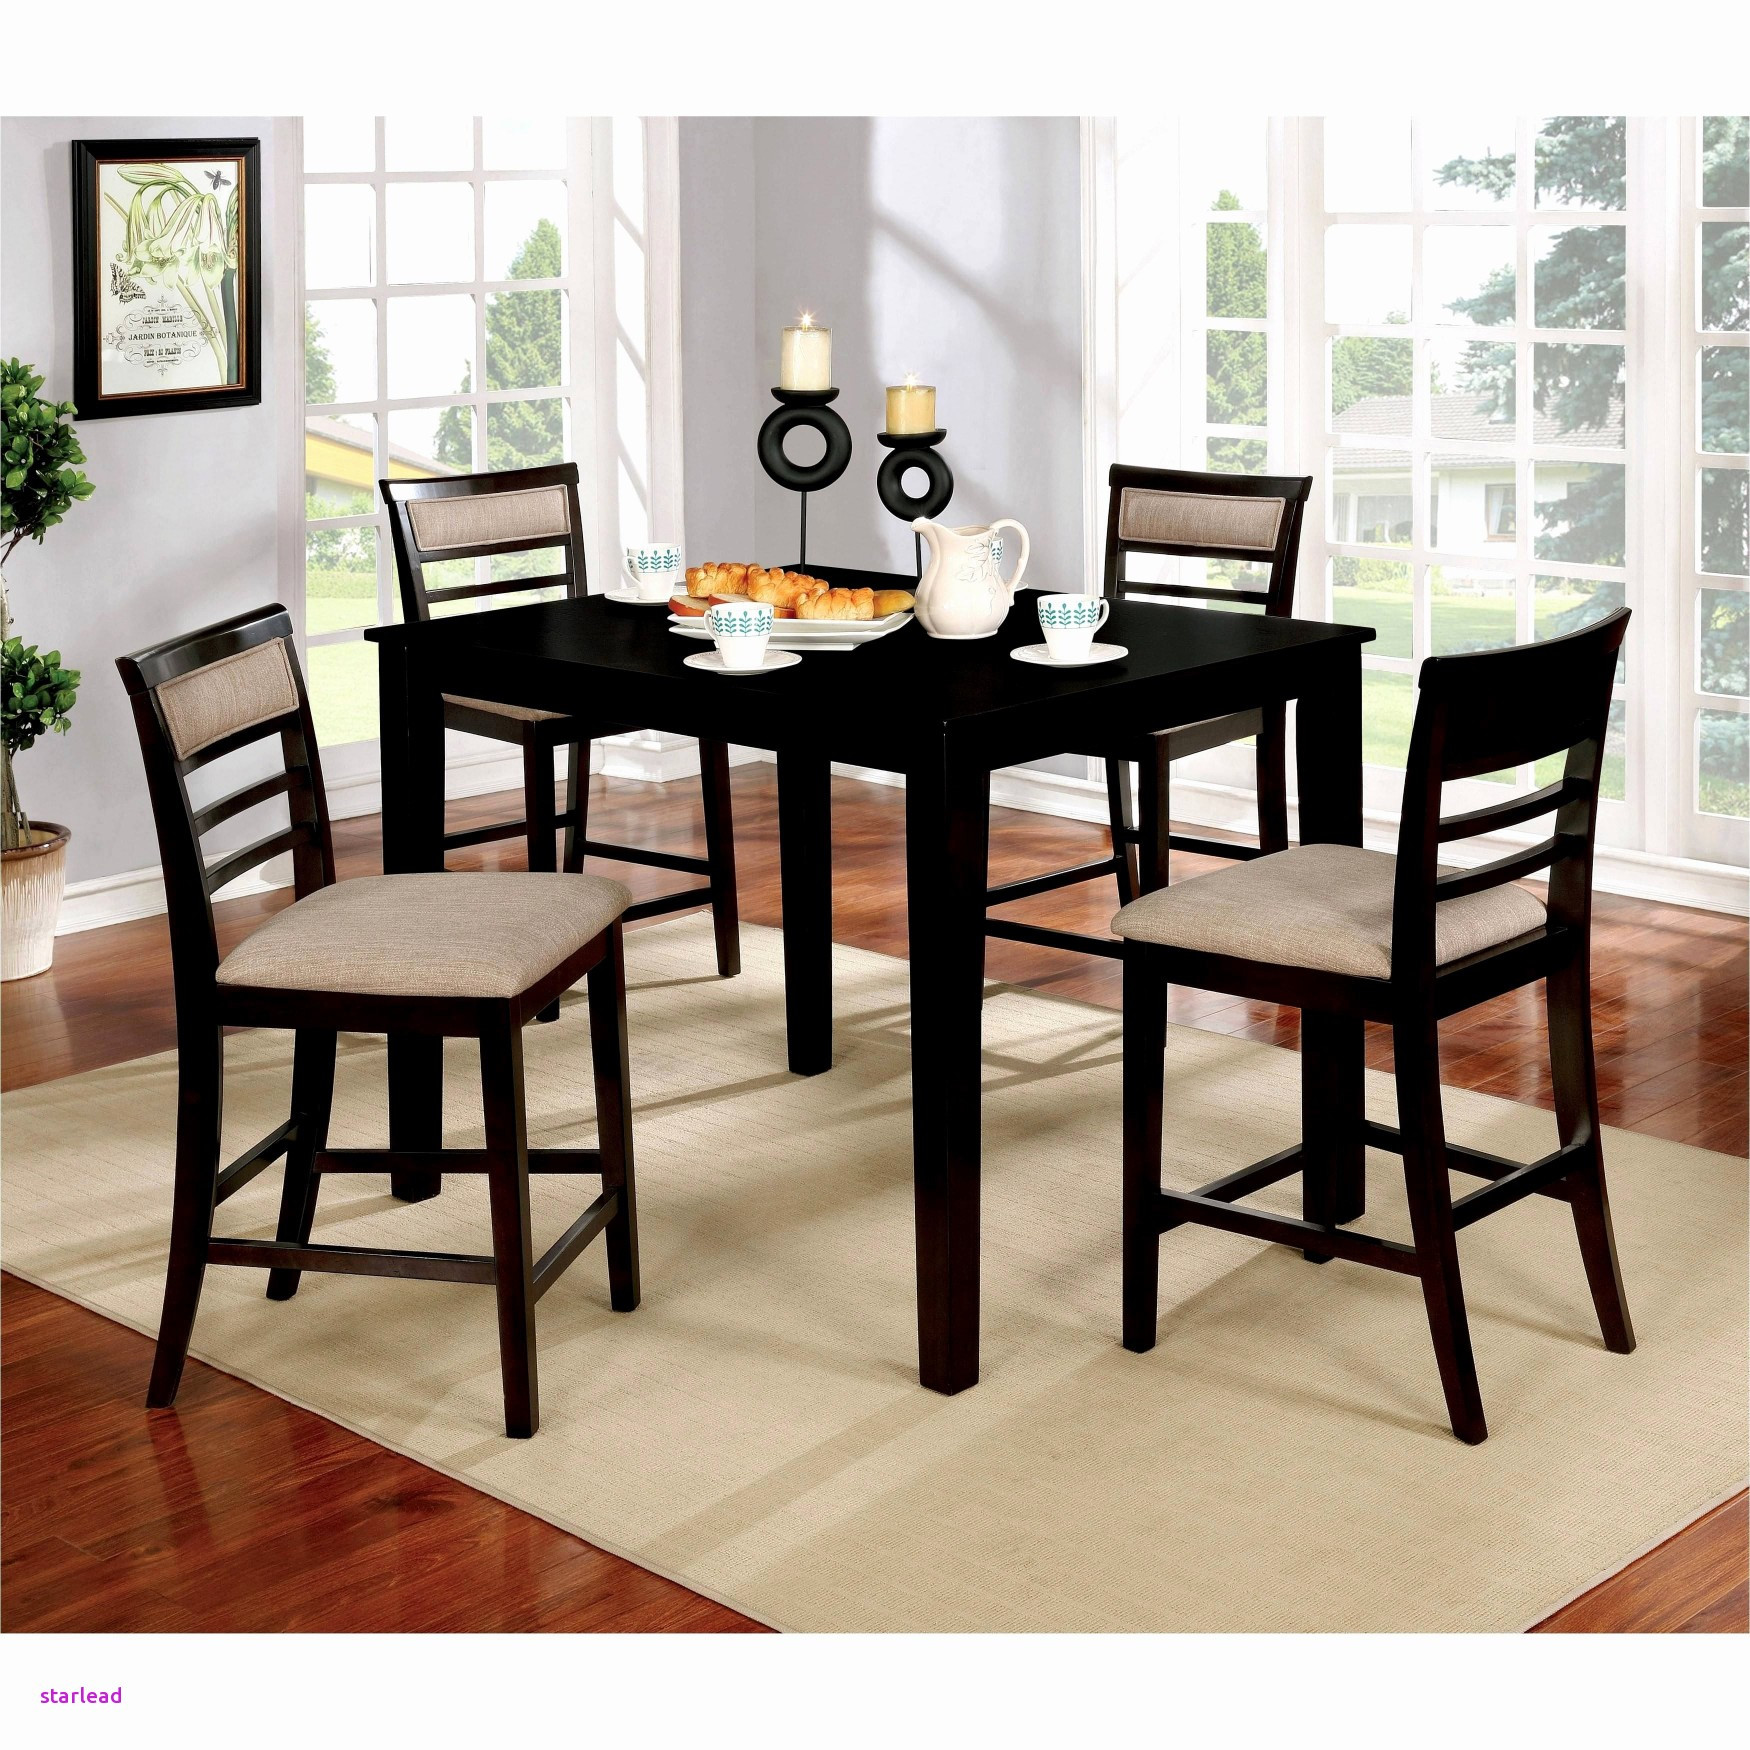 dark hardwood floors with dark furniture of black wood dining chairs 23 best dark wood dining table collection with regard to black wood dining chairs 23 best dark wood dining table collection